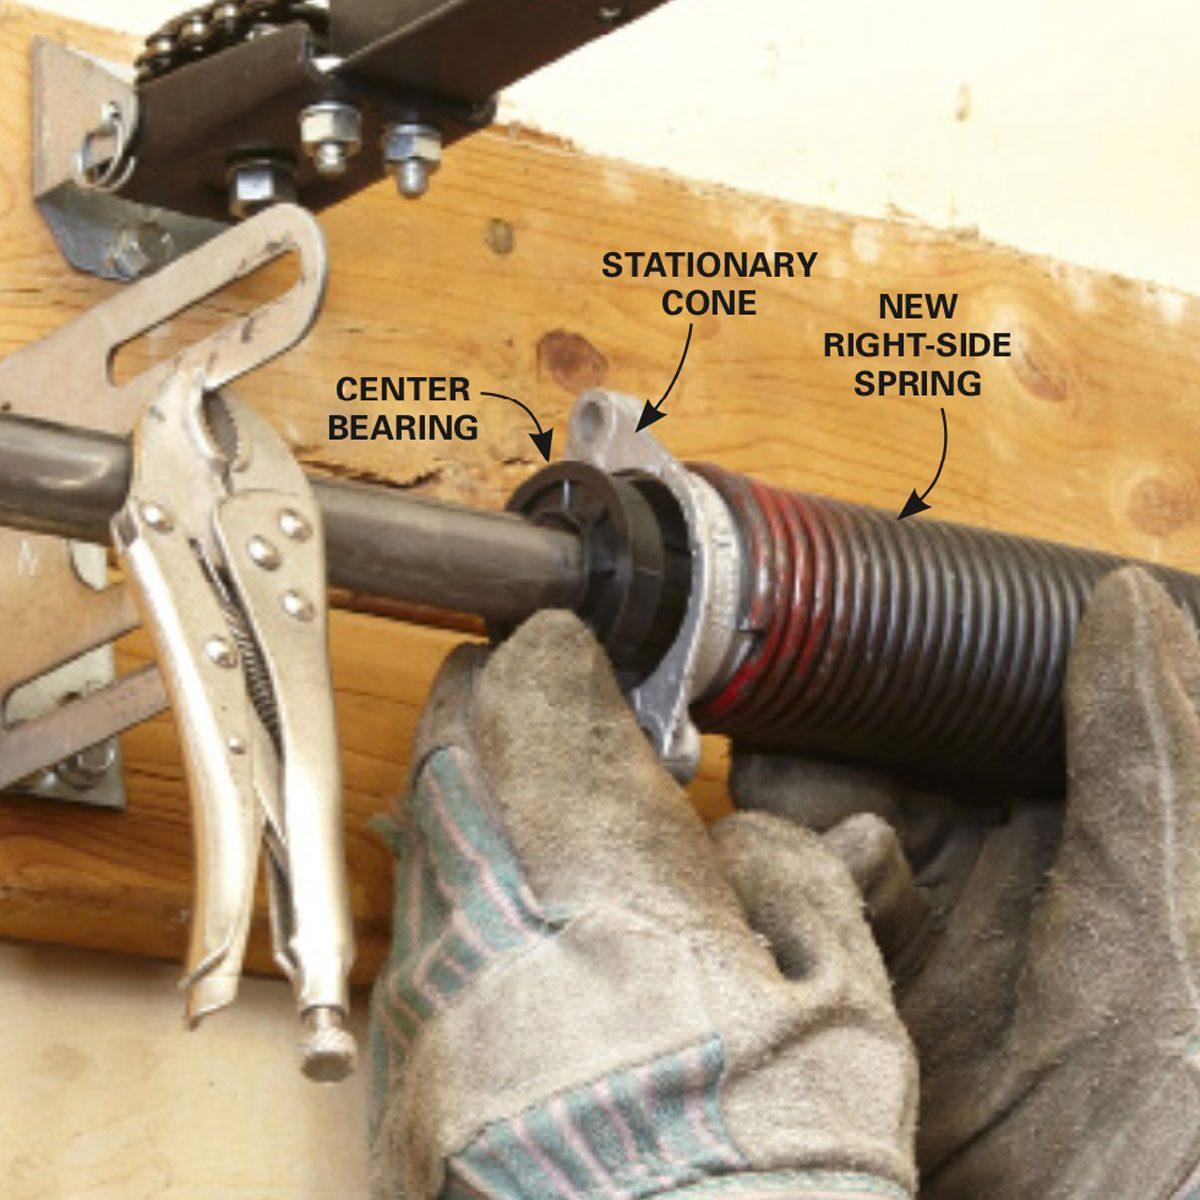 Install a new center bearing